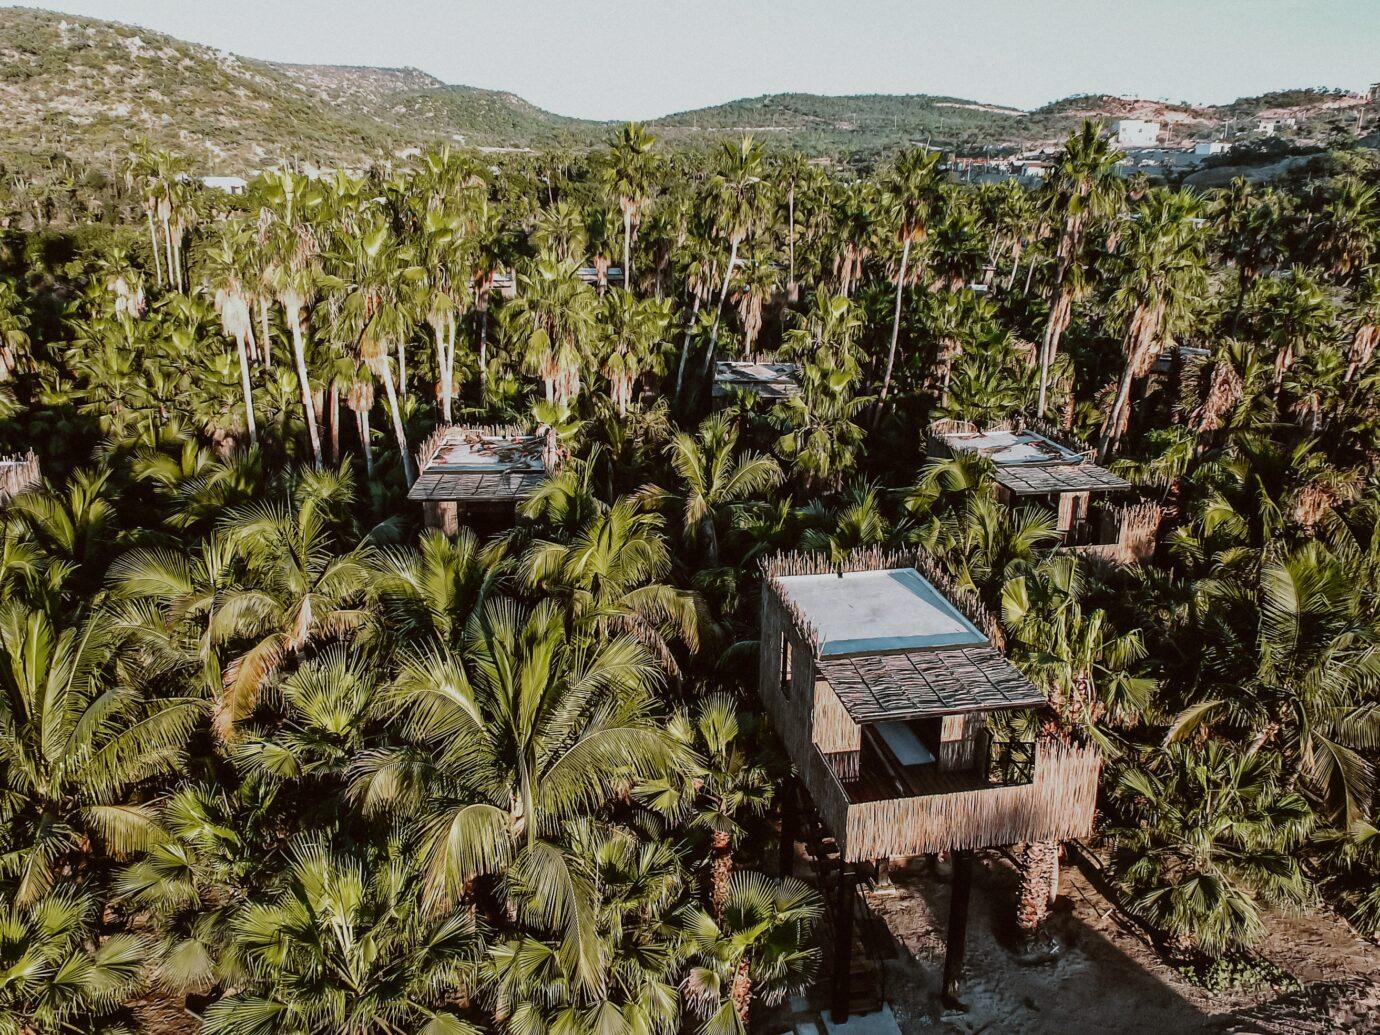 Acre in Baja California